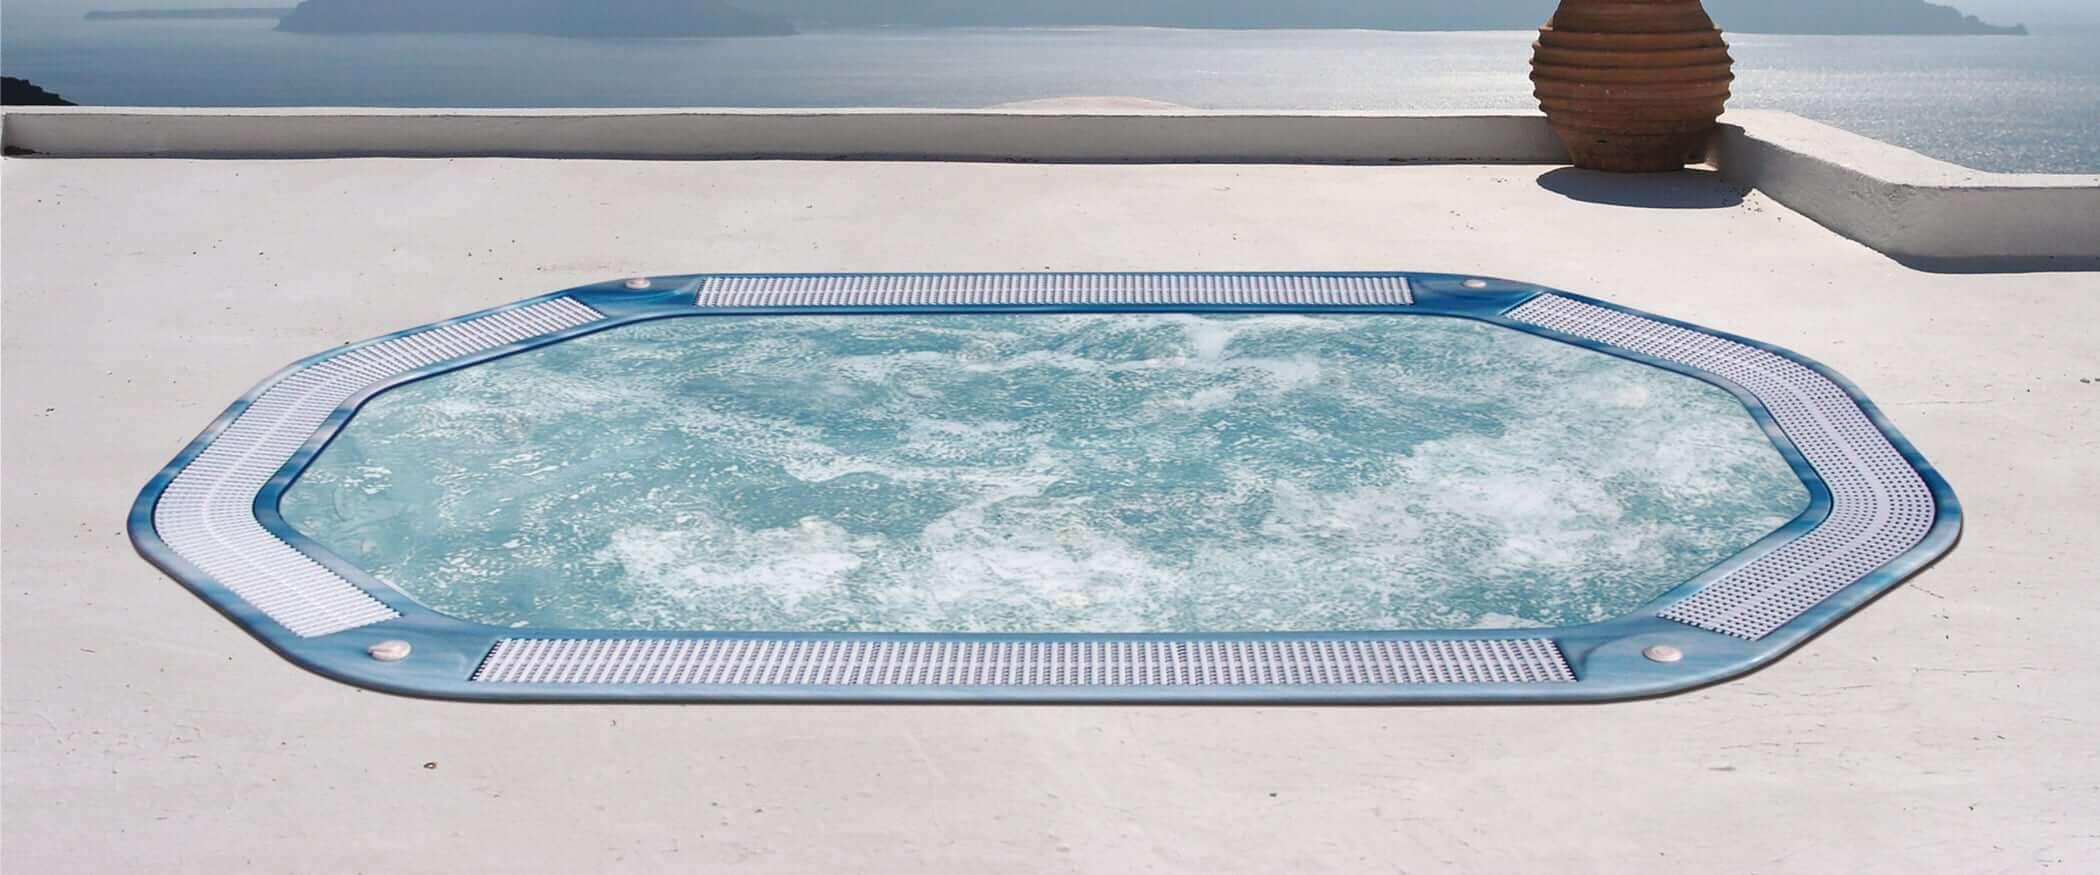 Jacuzzi Grande Taille.Spa Hydra Jacuzzi 10 Places Grandes Dimensions Aquavia